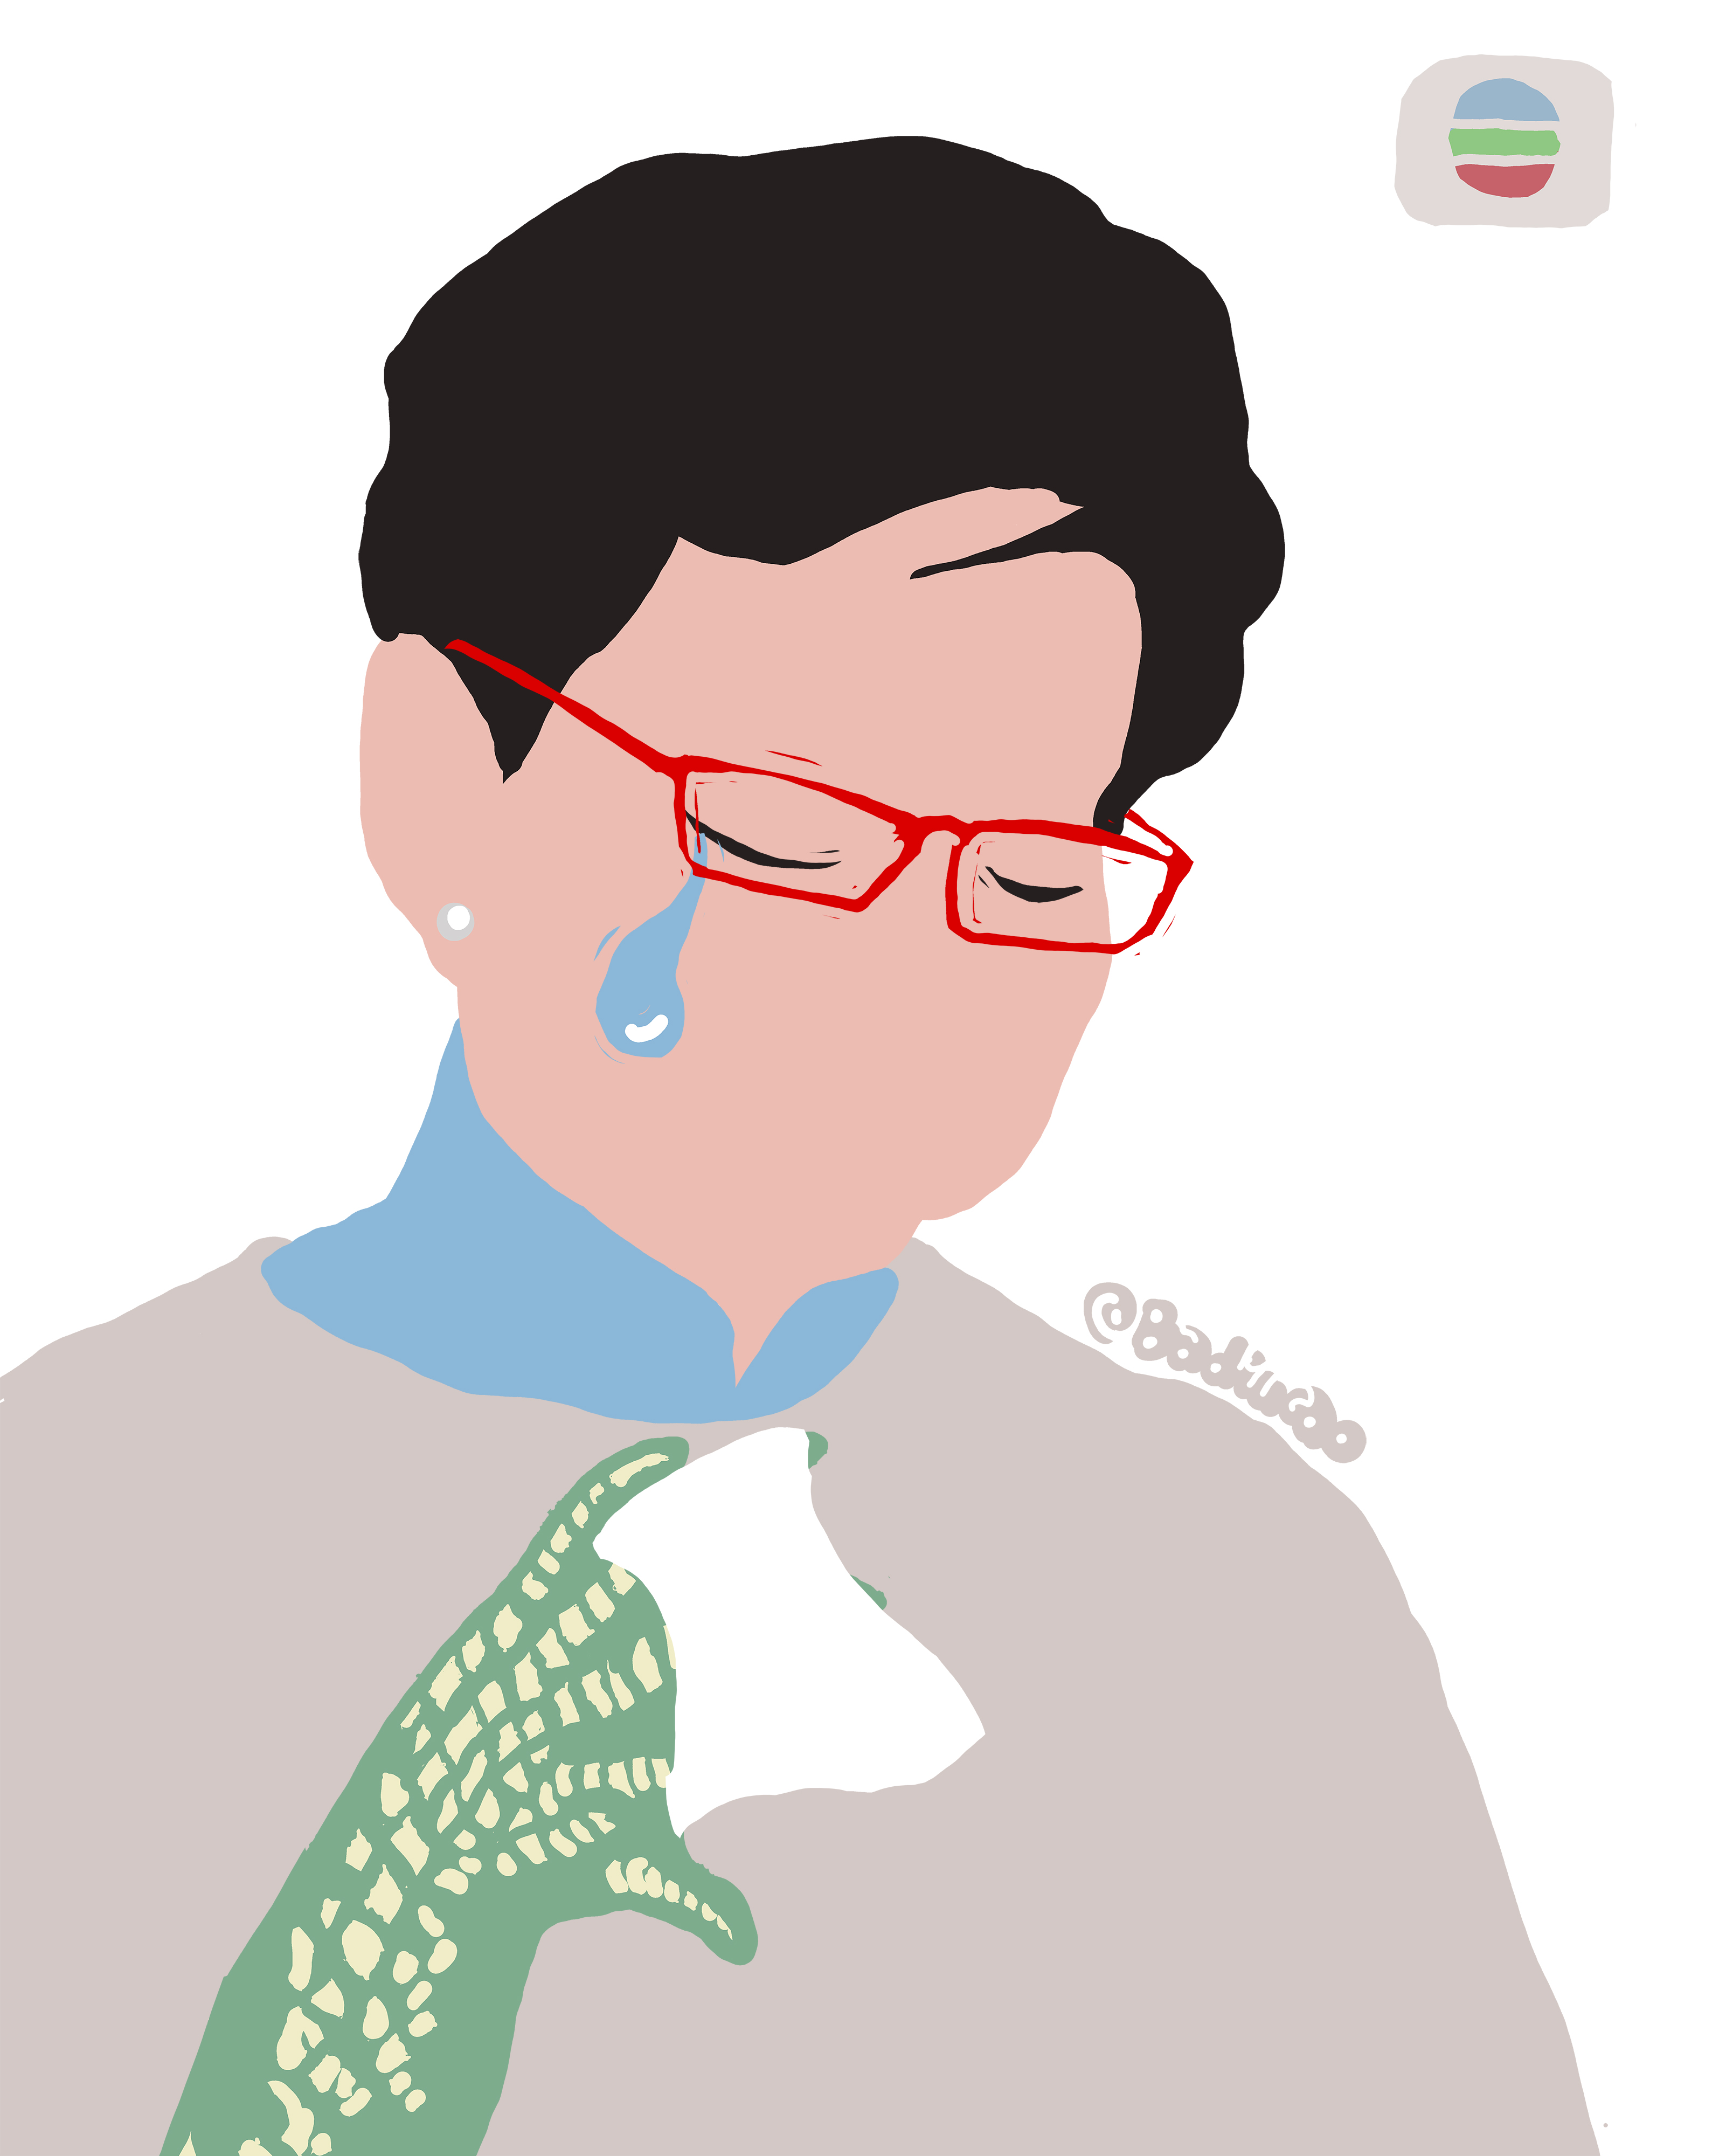 A Badicao cartoon depicting Carrie Lam, Hong Kong's Chief Executive